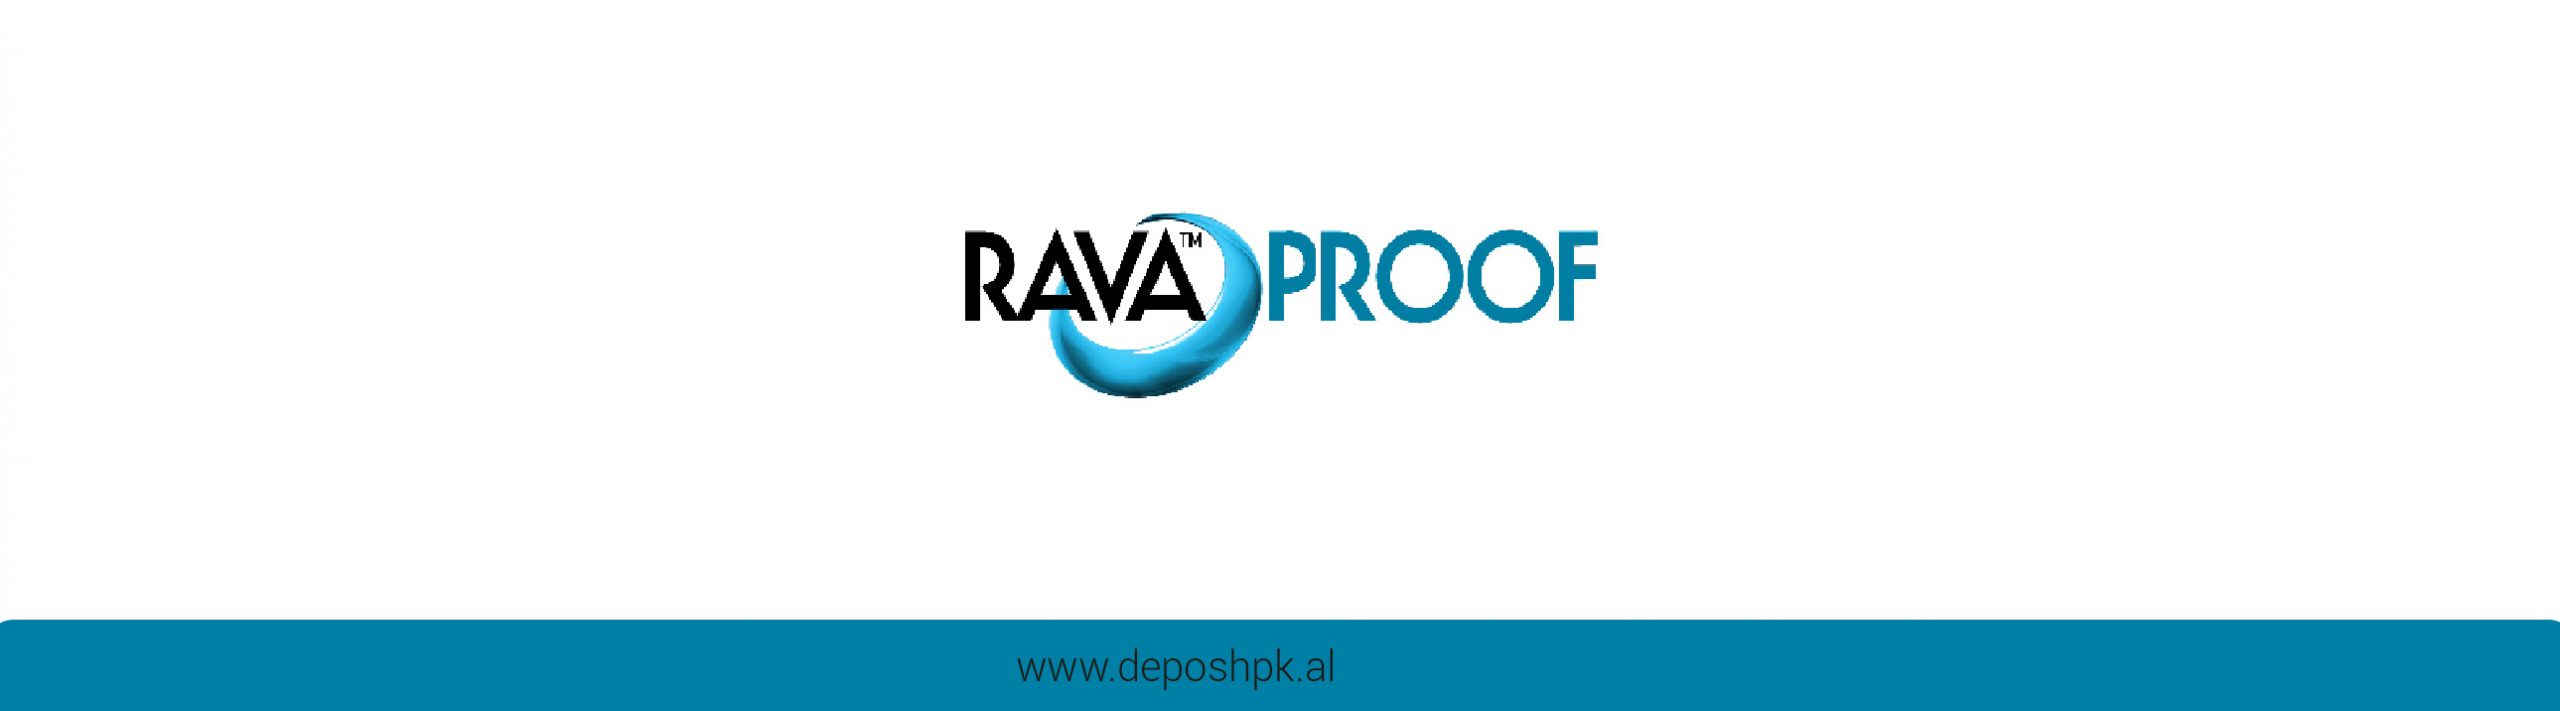 https://www.deposhpk.al/wp-content/uploads/2019/12/ravaproof-produkt-deposhpk.al_-scaled.jpg